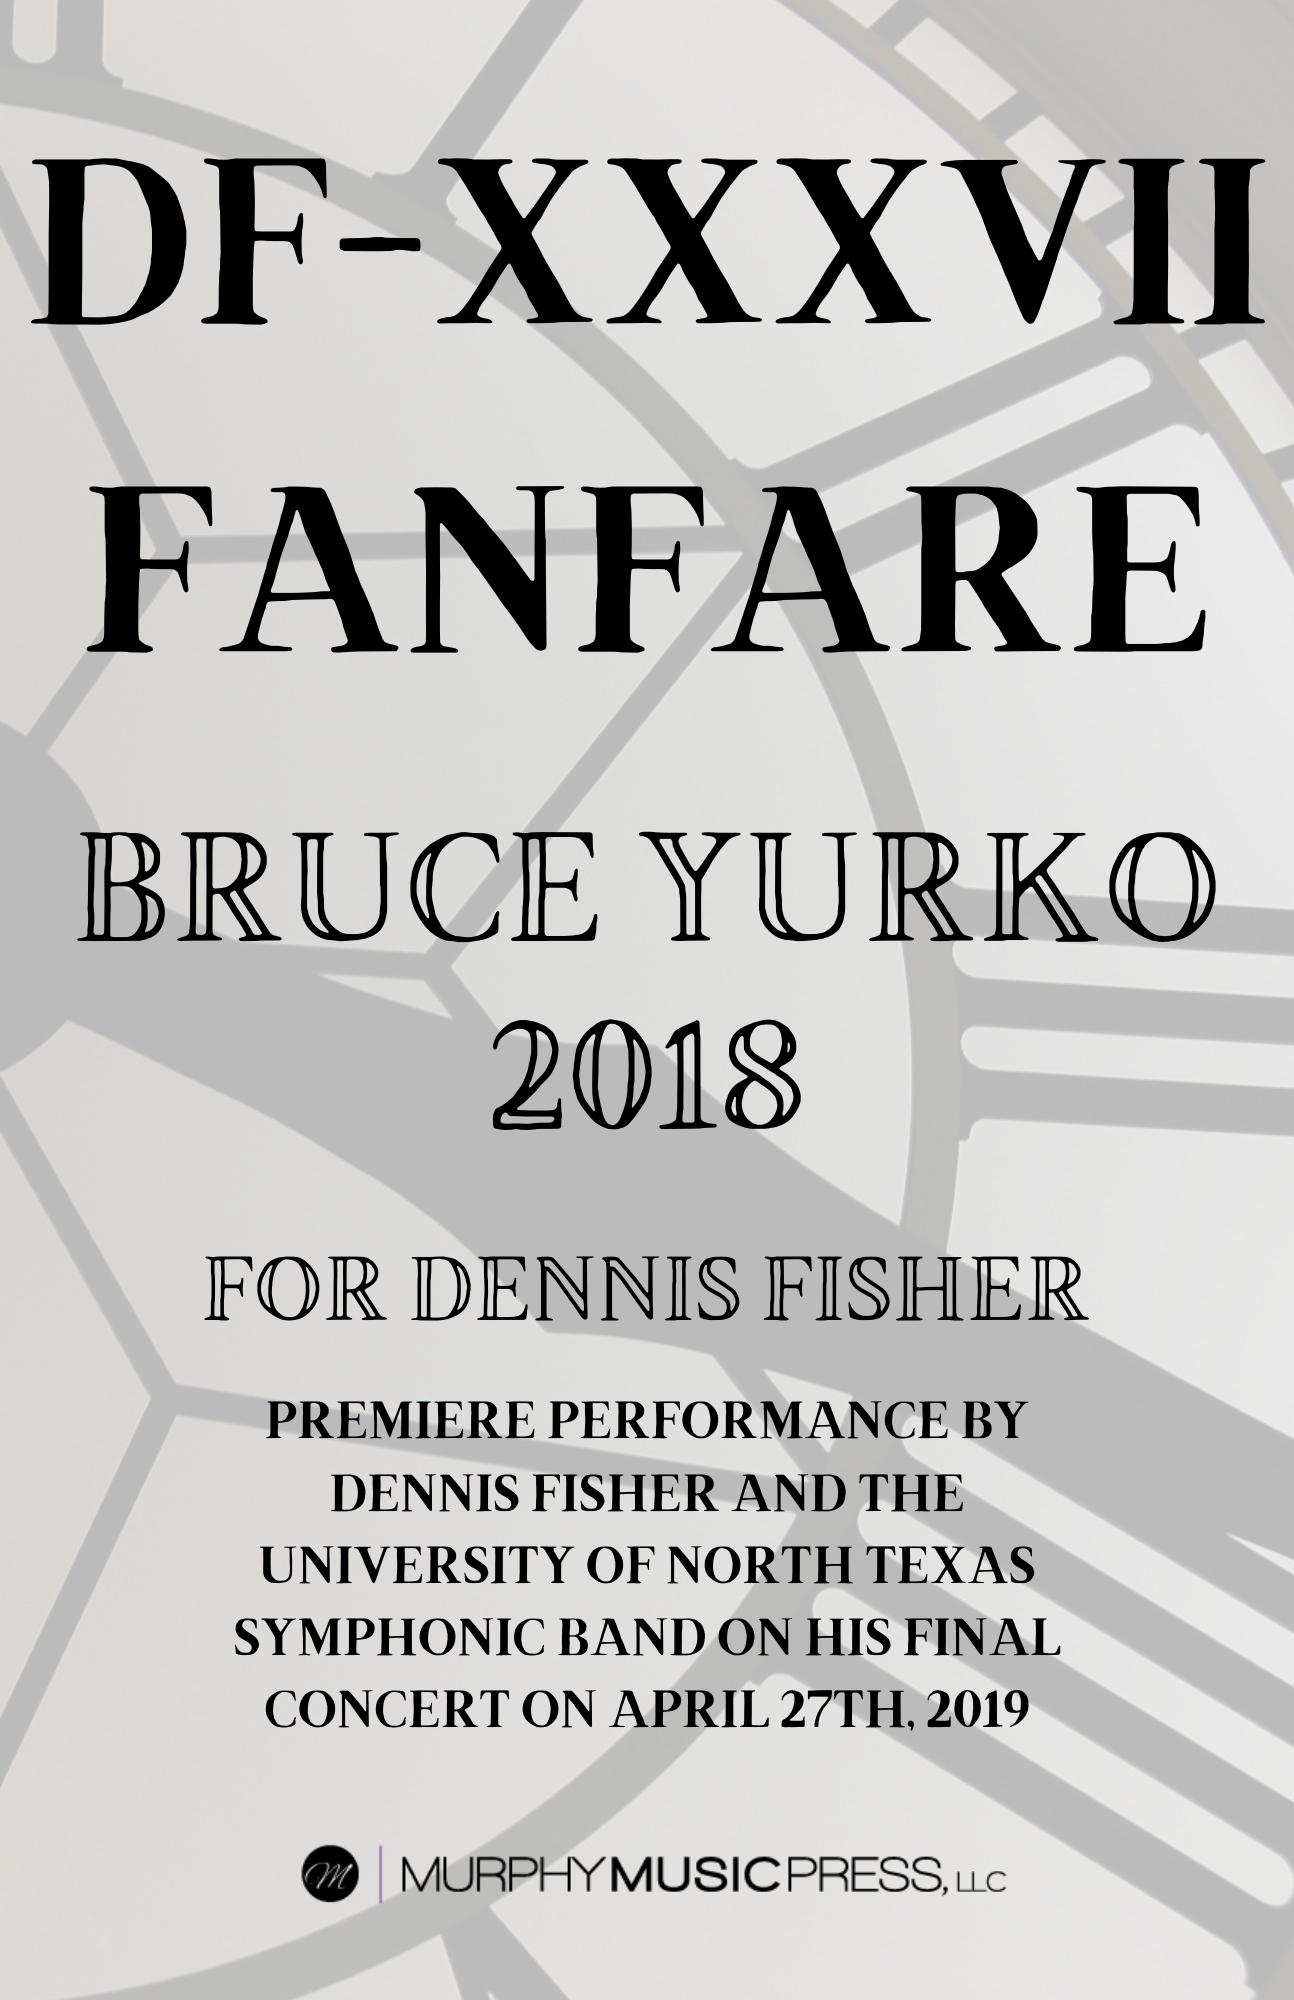 DF-XXXVII by Bruce Yurko